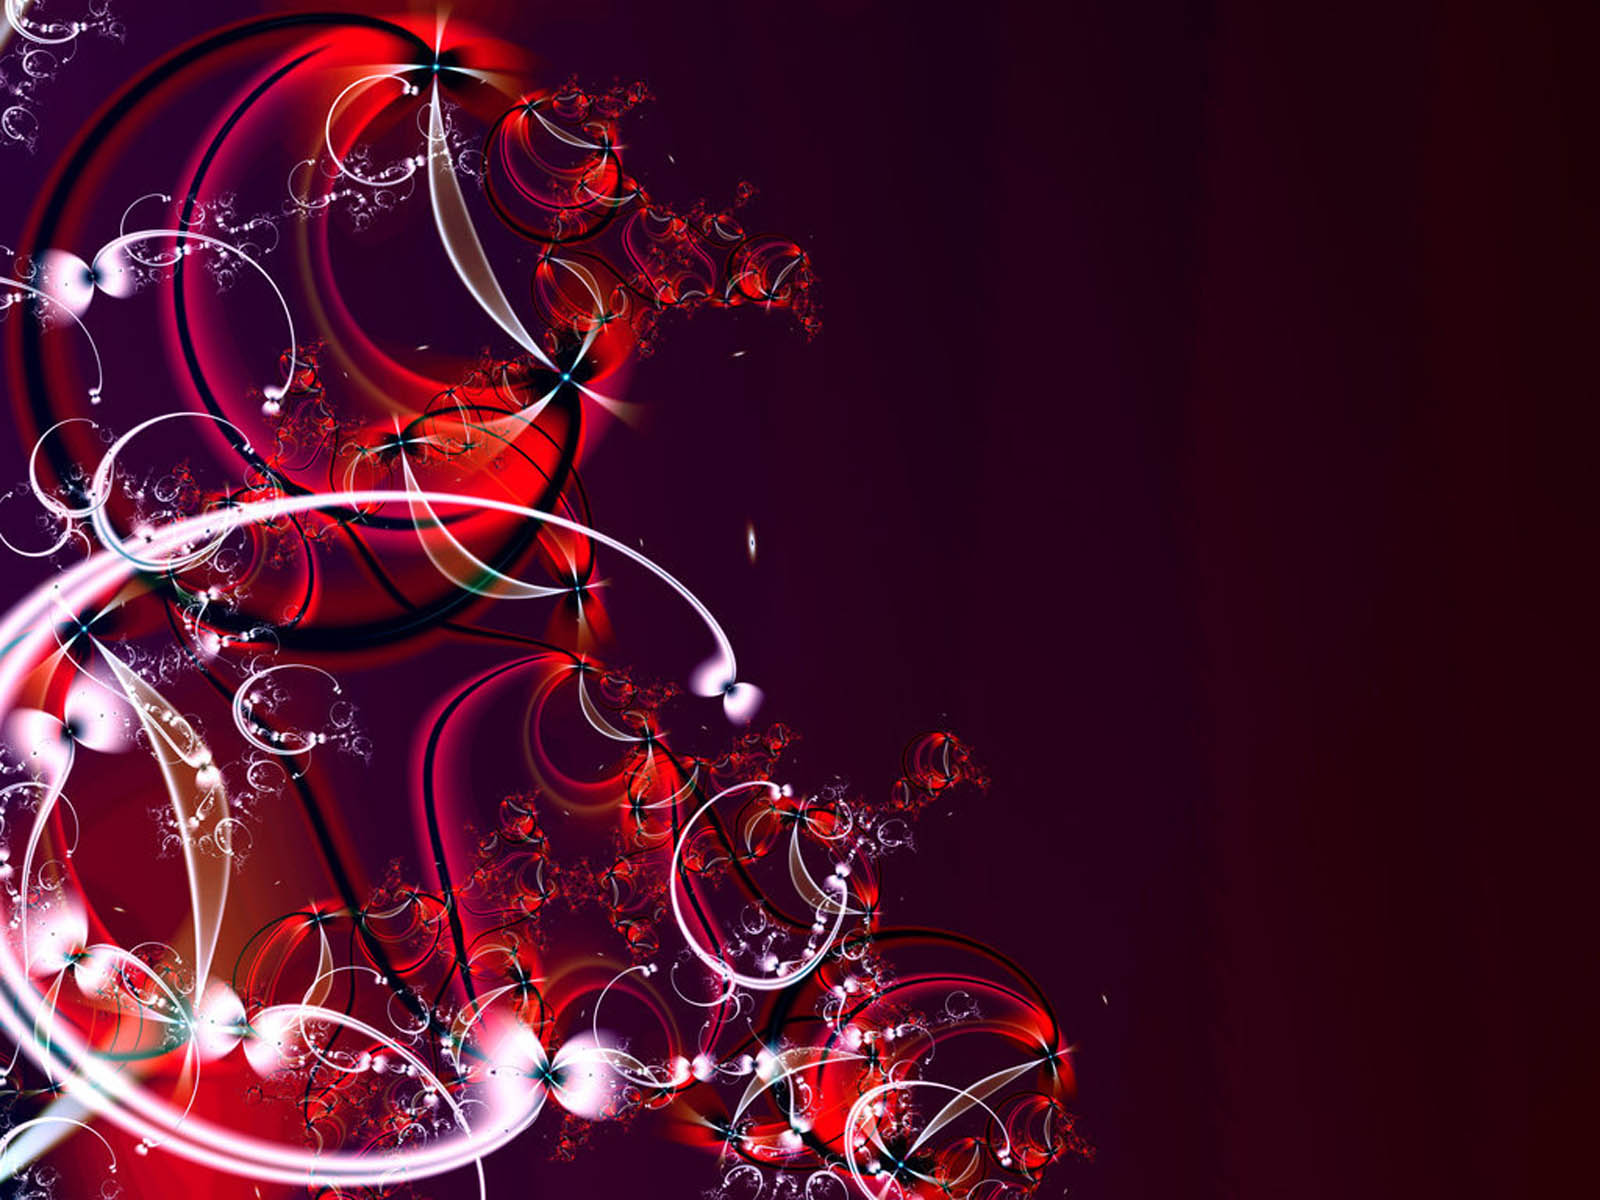 Fractal art wallpapers desktop wallpaper - Art wallpaper pictures ...